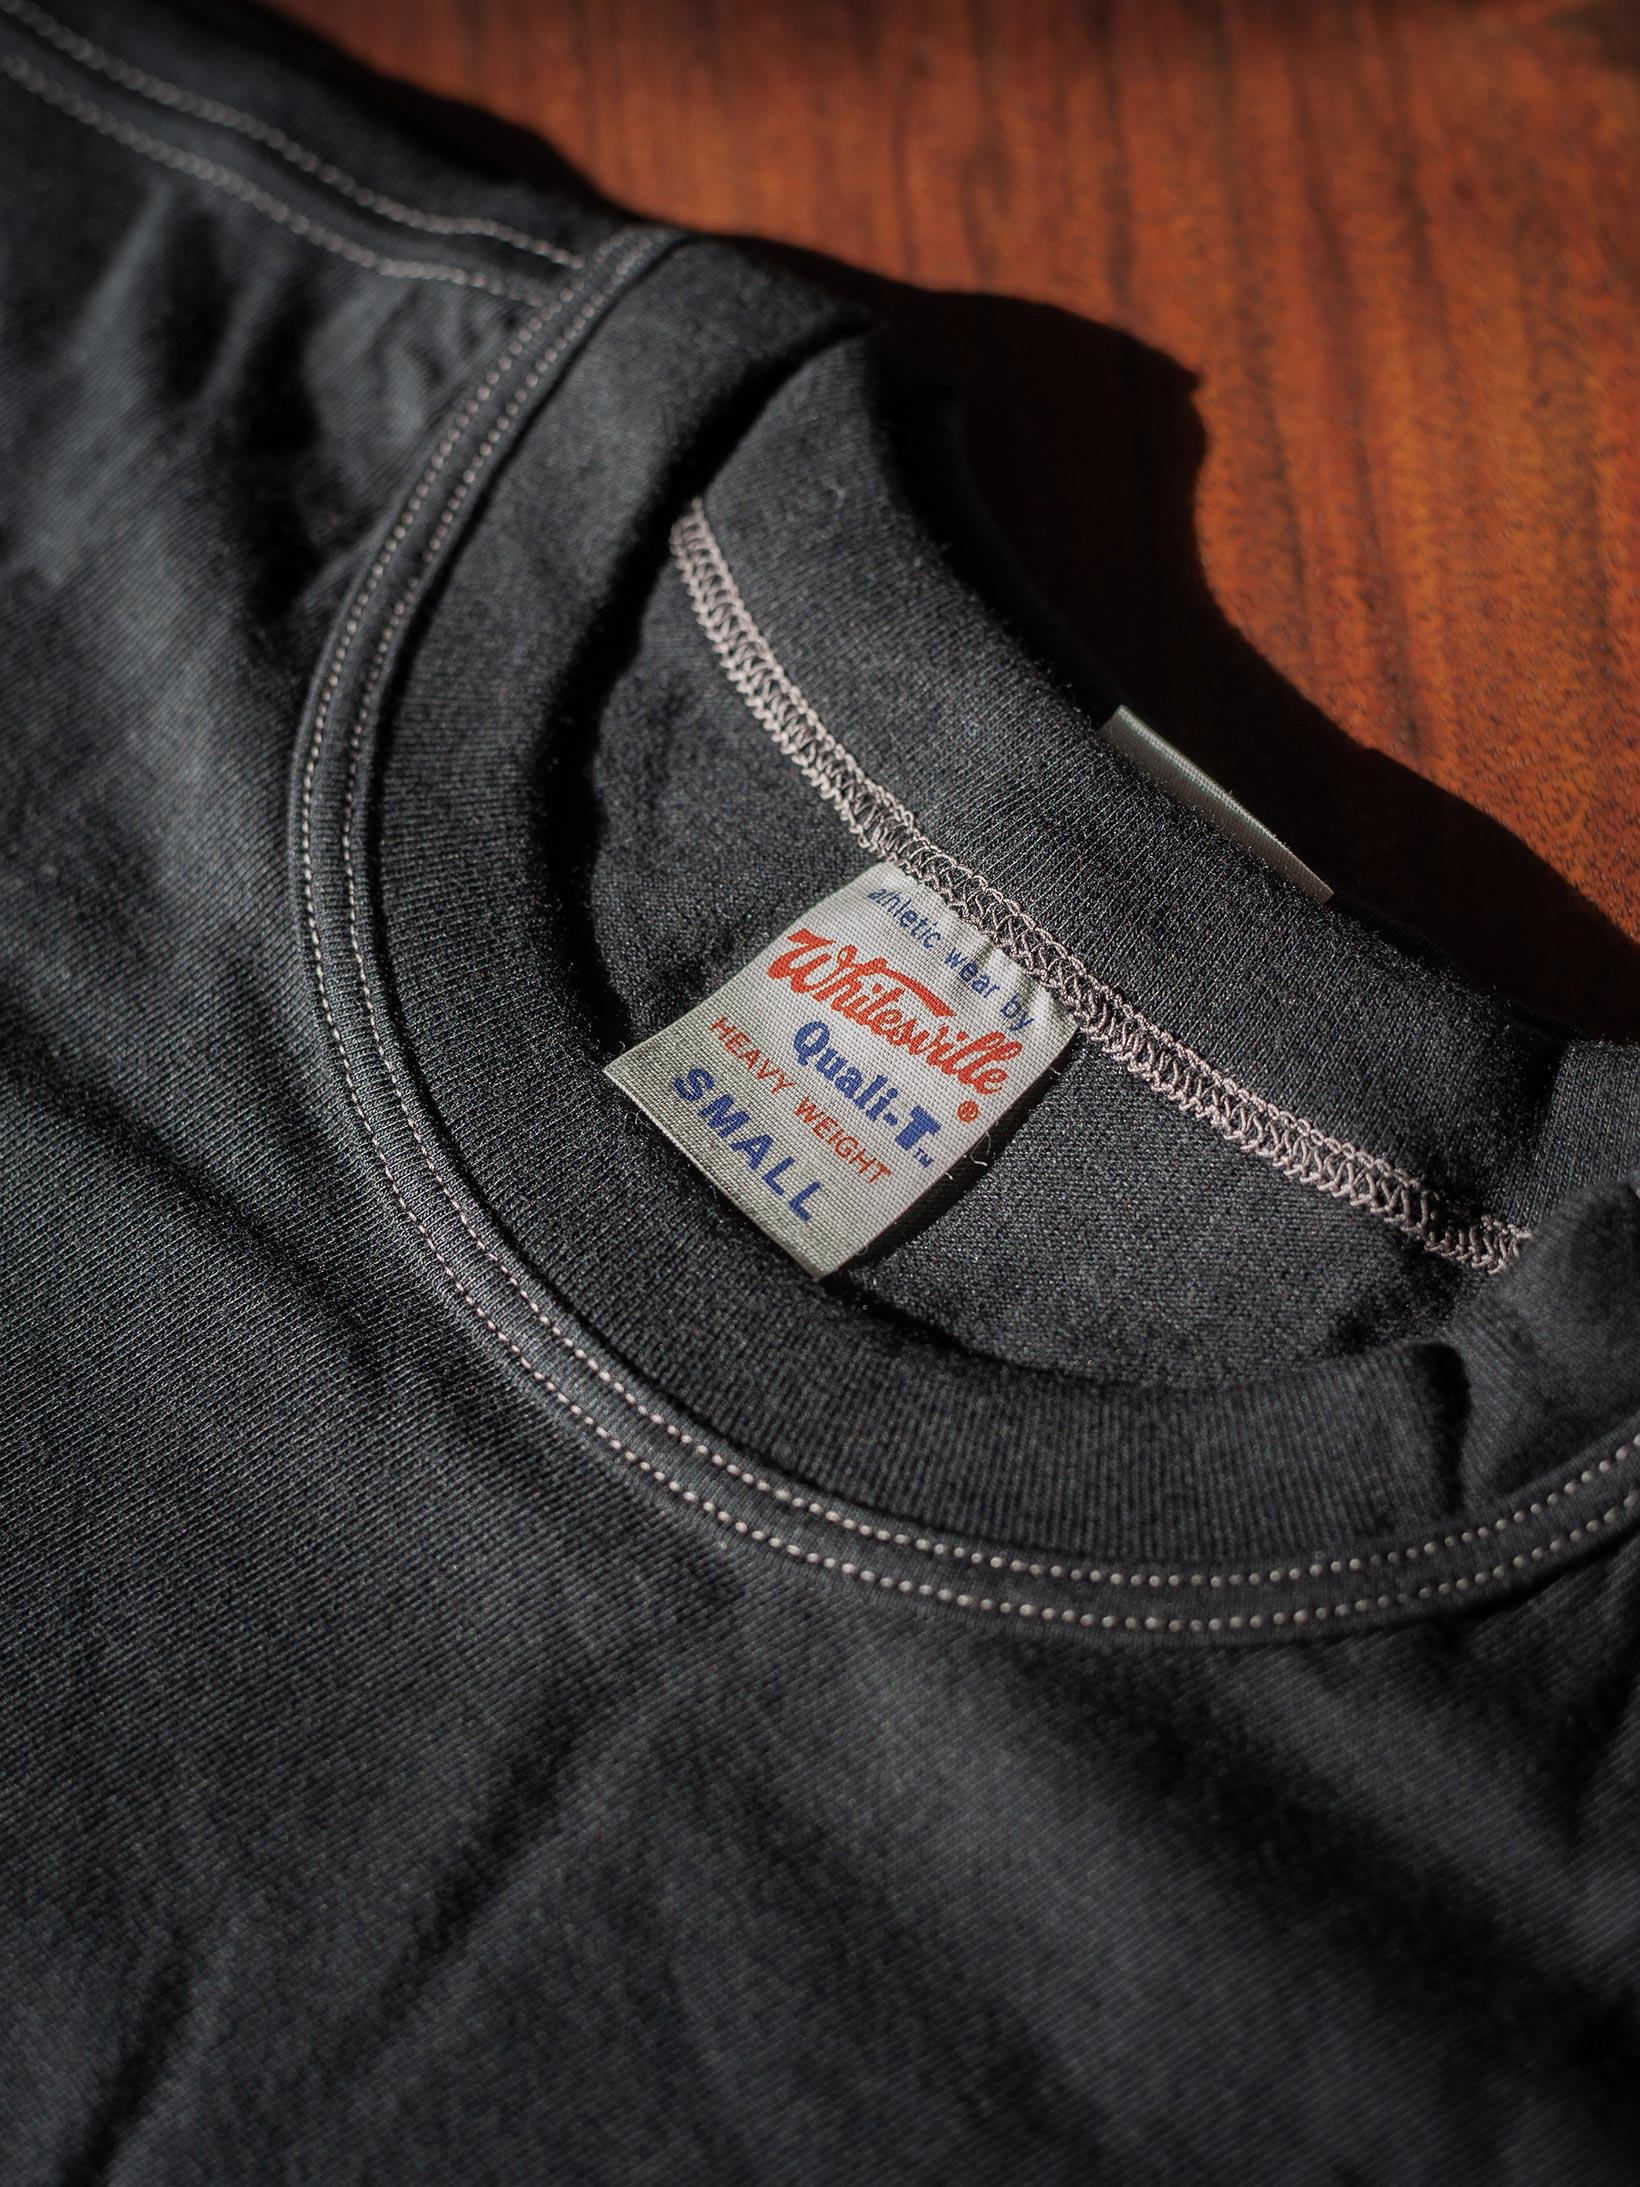 Whitesville Japanese Made T-Shirts - White (2-Pack) - Image 7